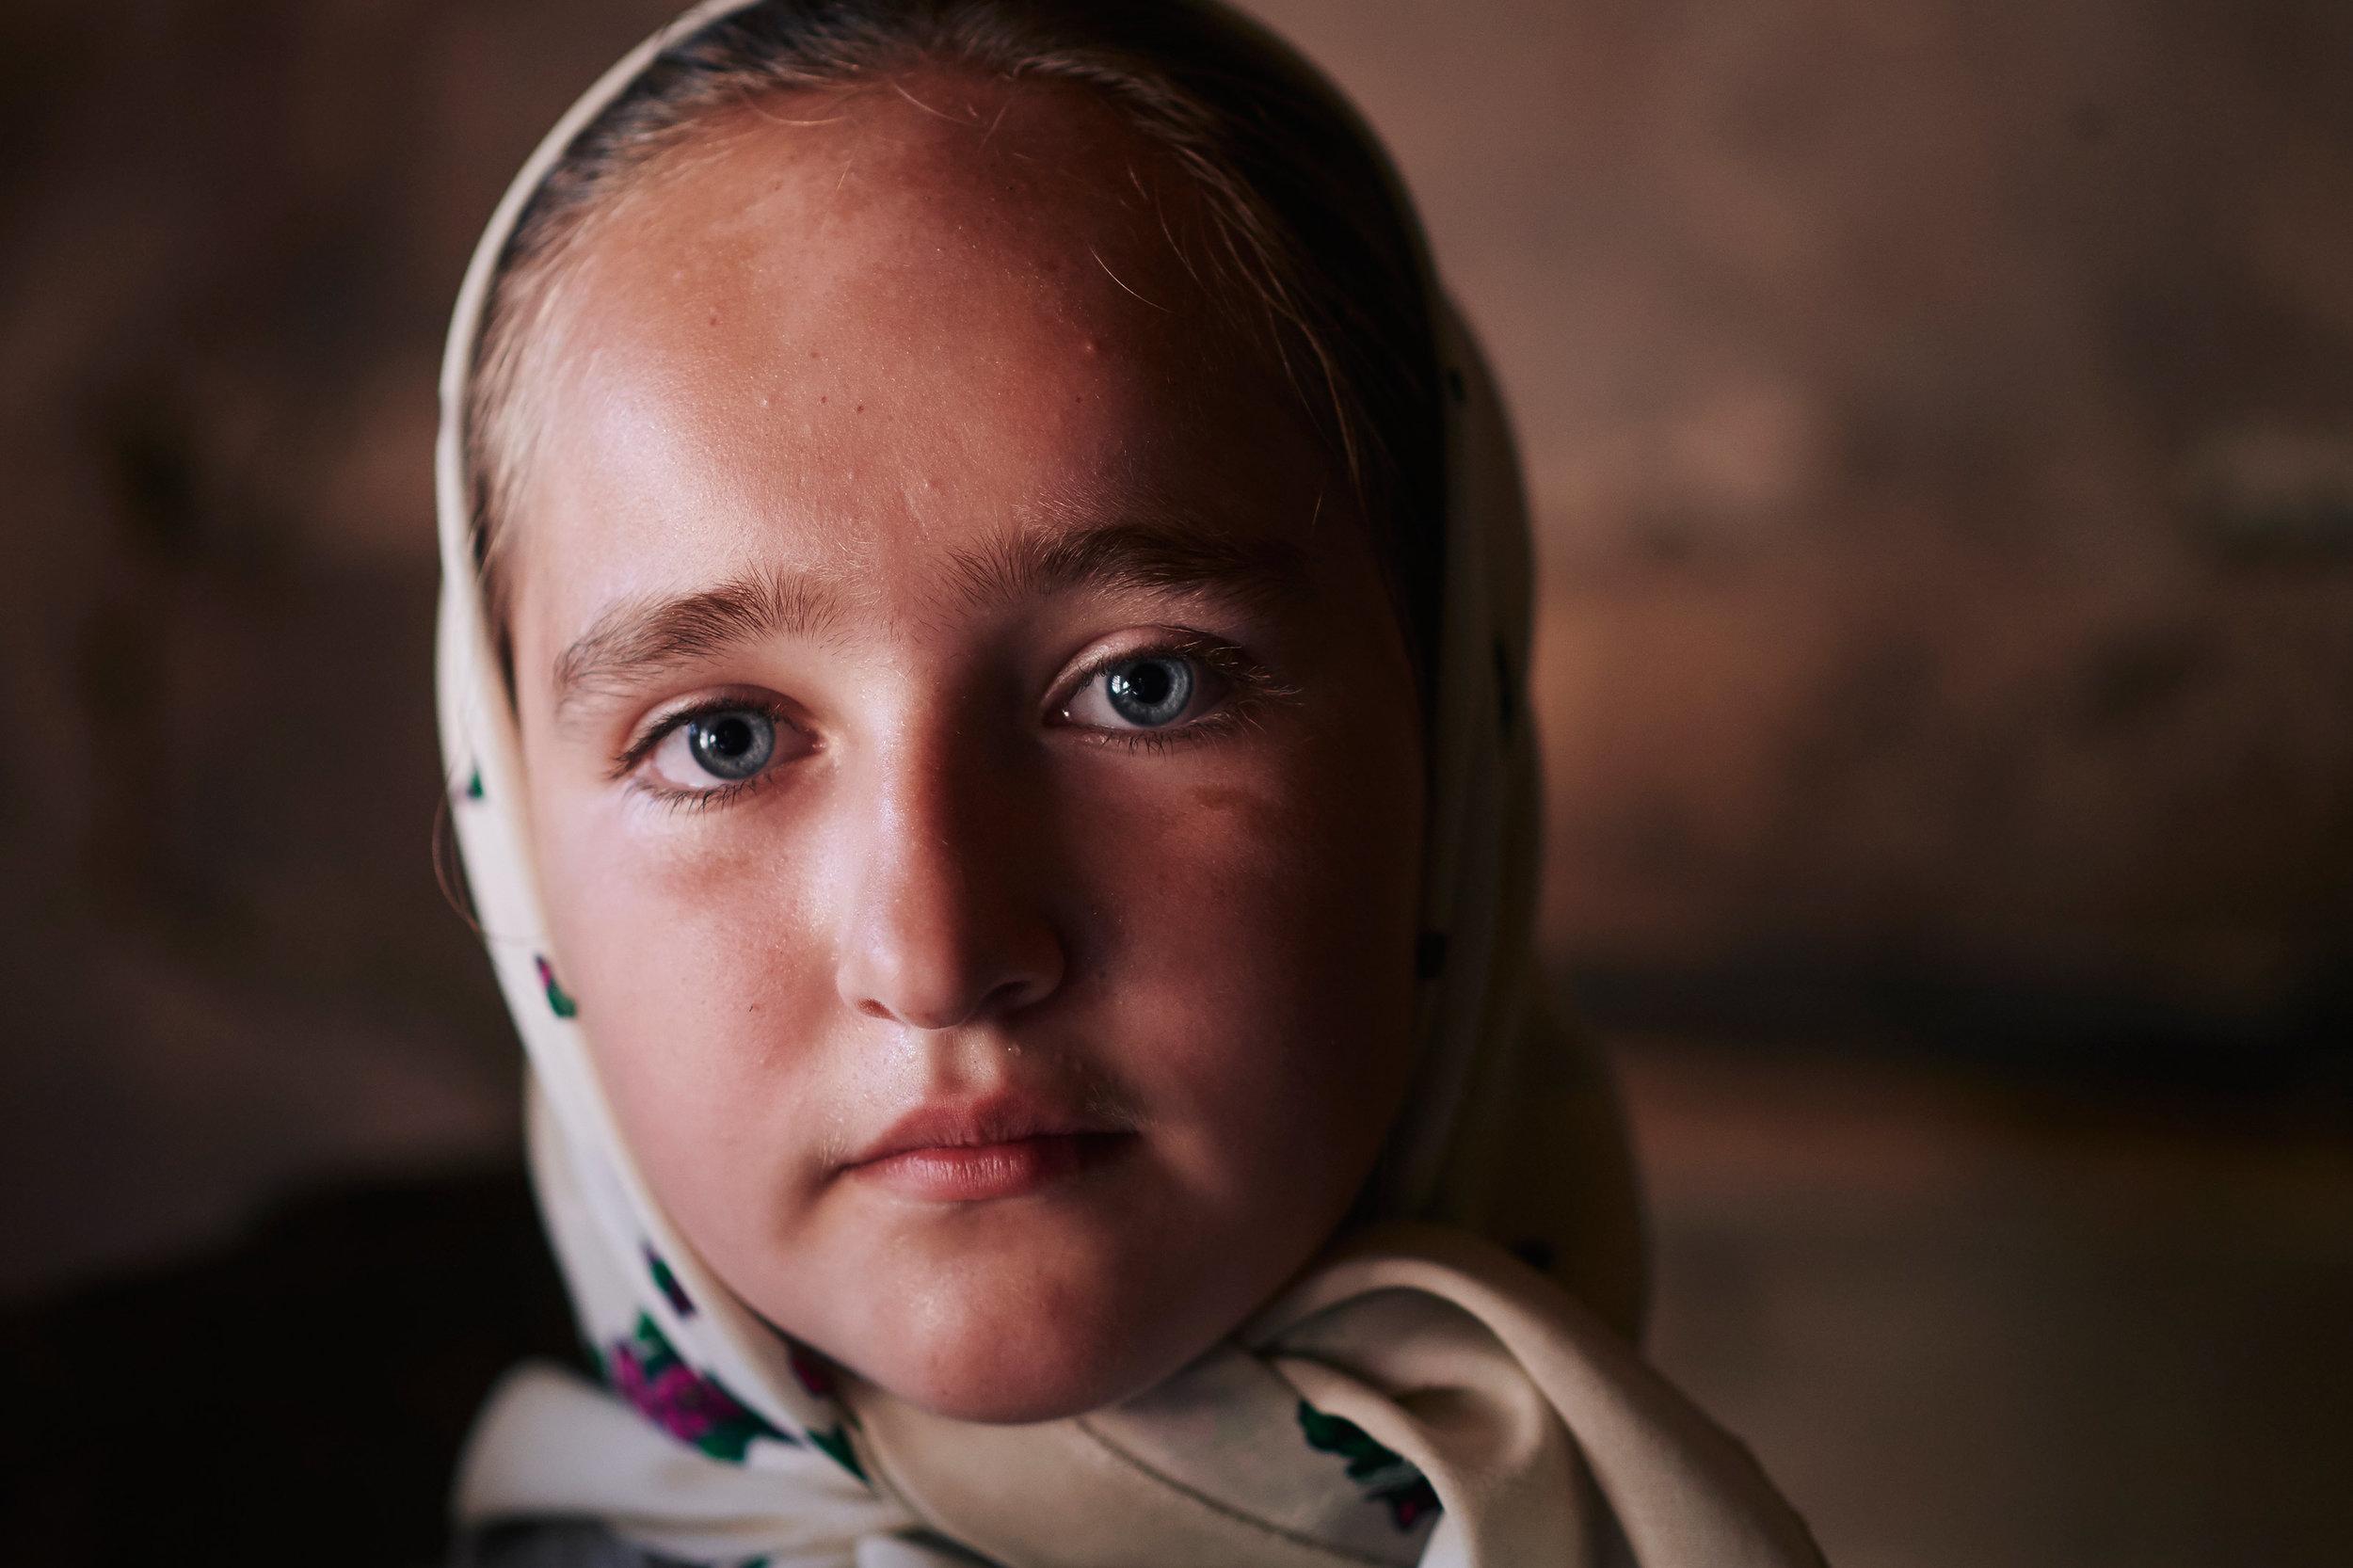 Maramures-Romania-rural-Romanian-girl-portrait